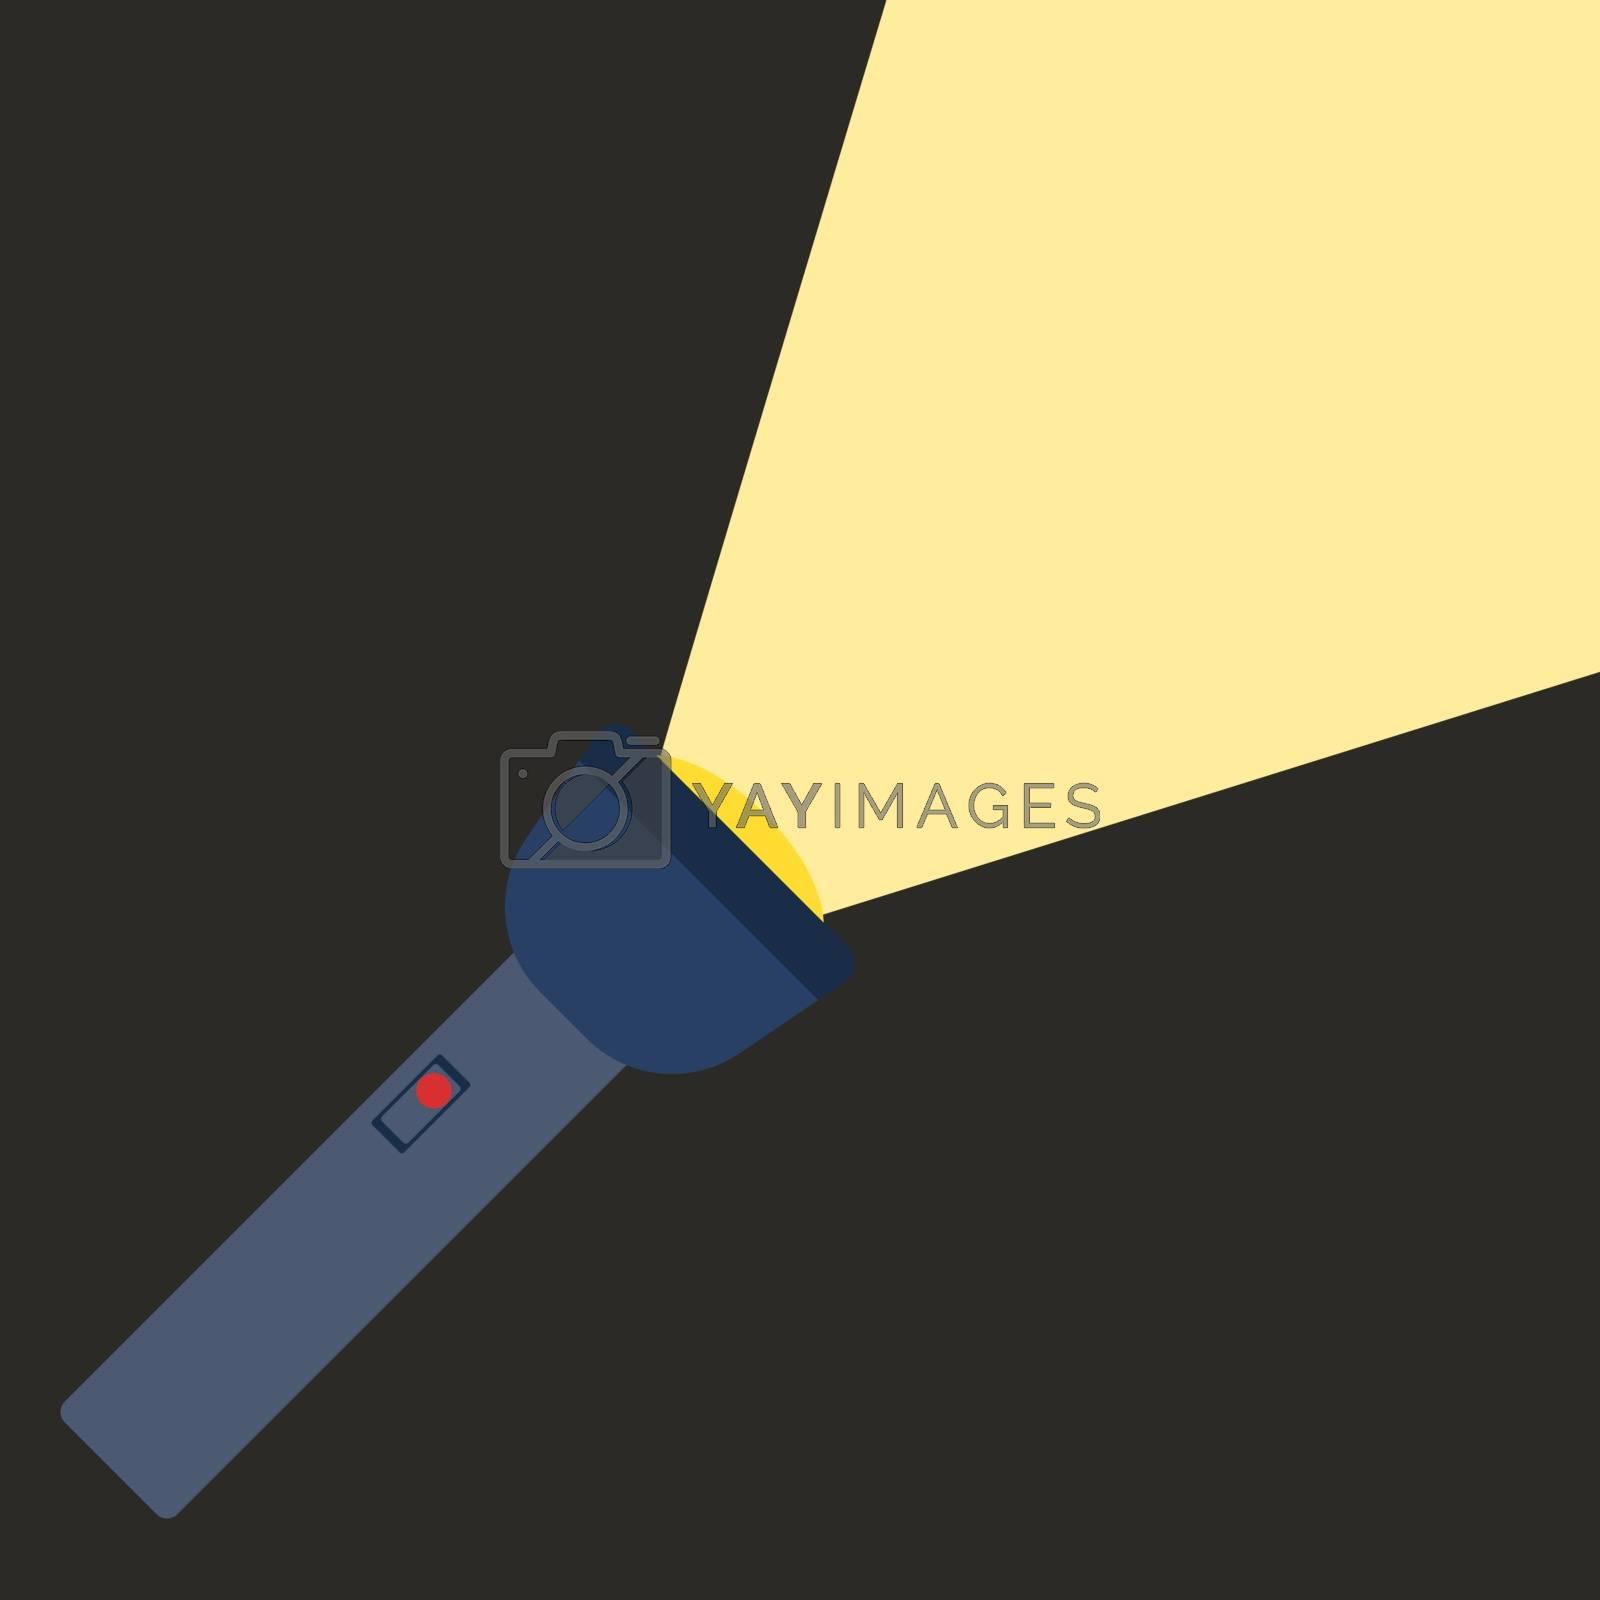 Flashlight, illustration, vector on white background.